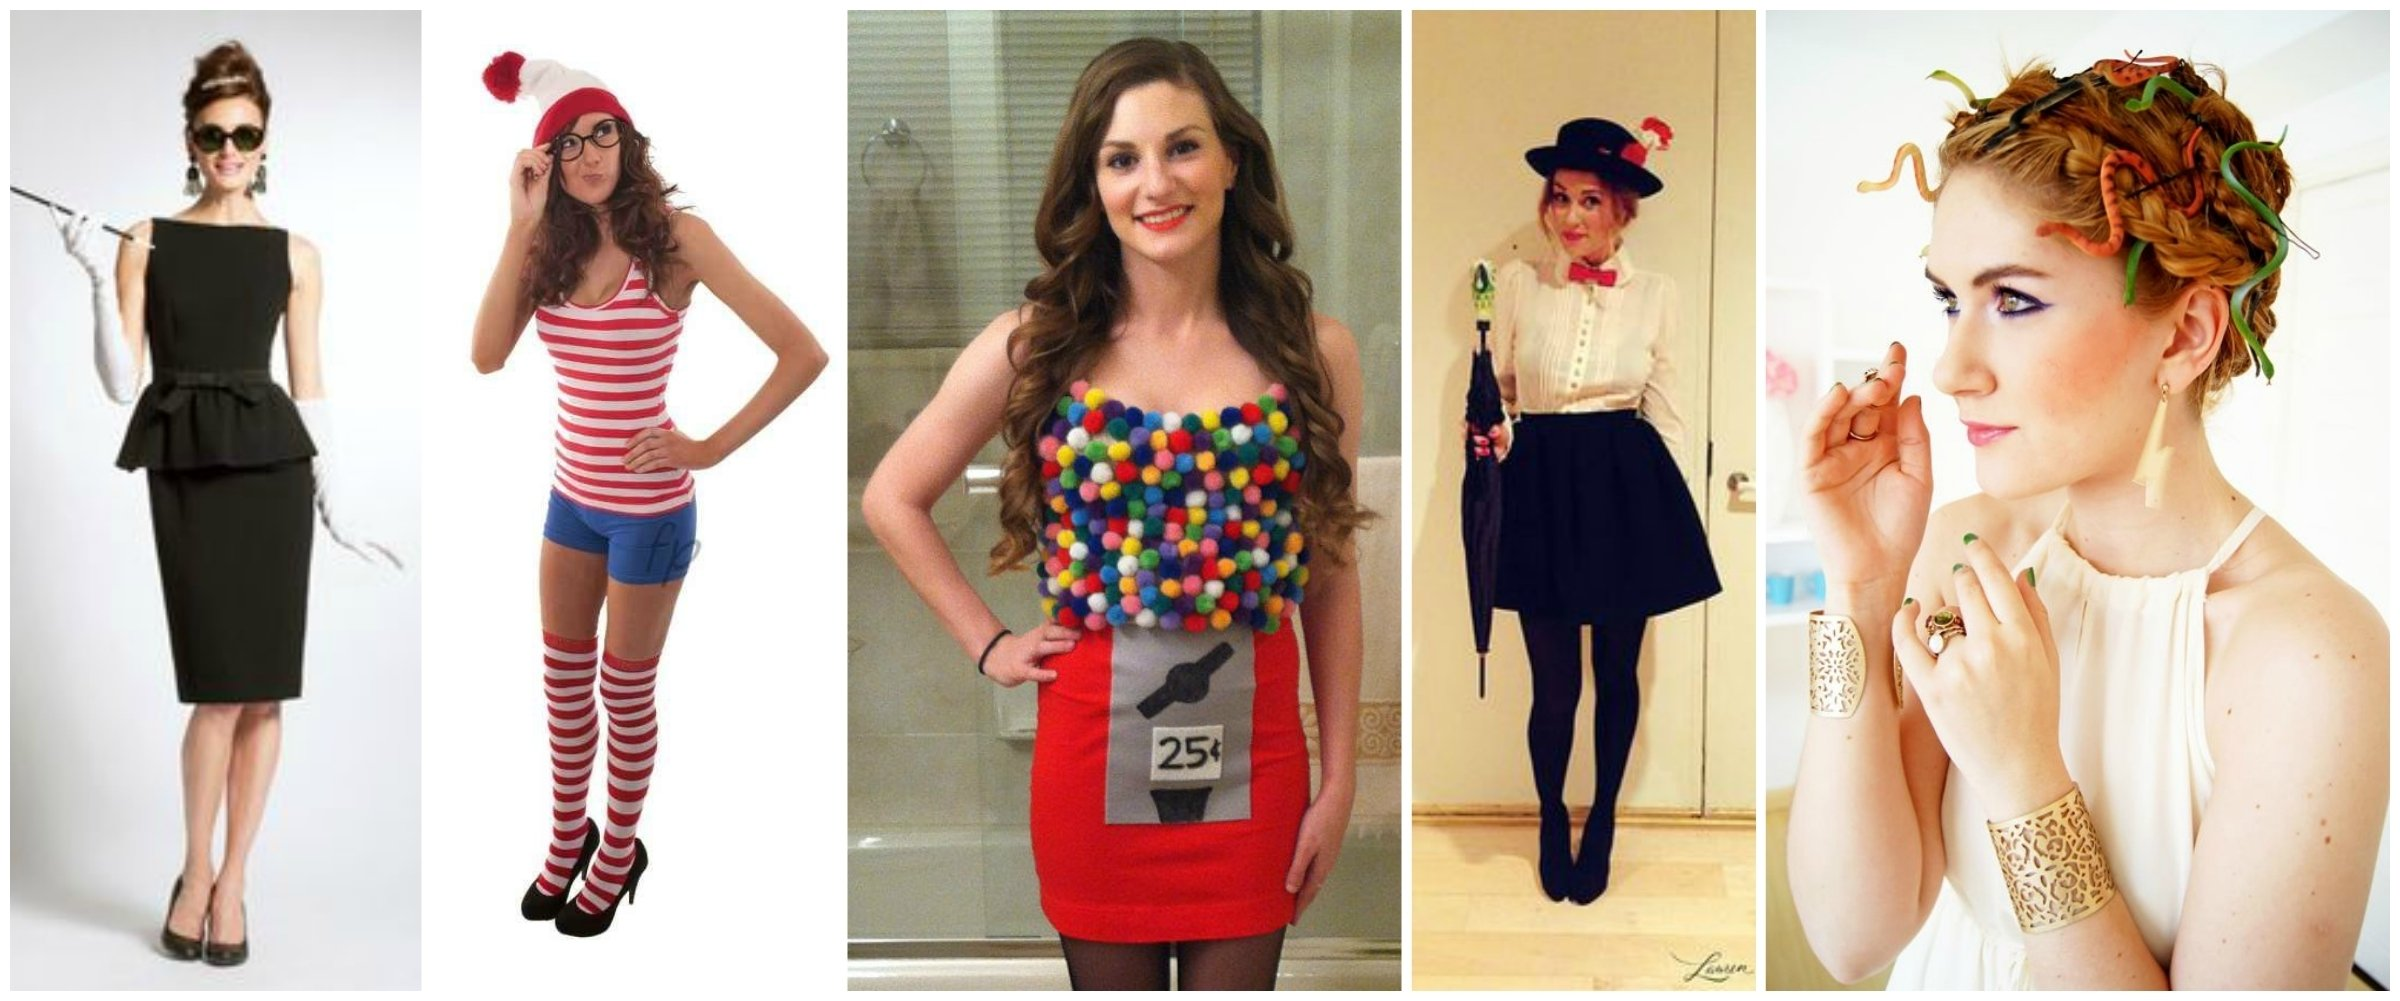 image gallery homemade halloween costumes girls, diy halloween